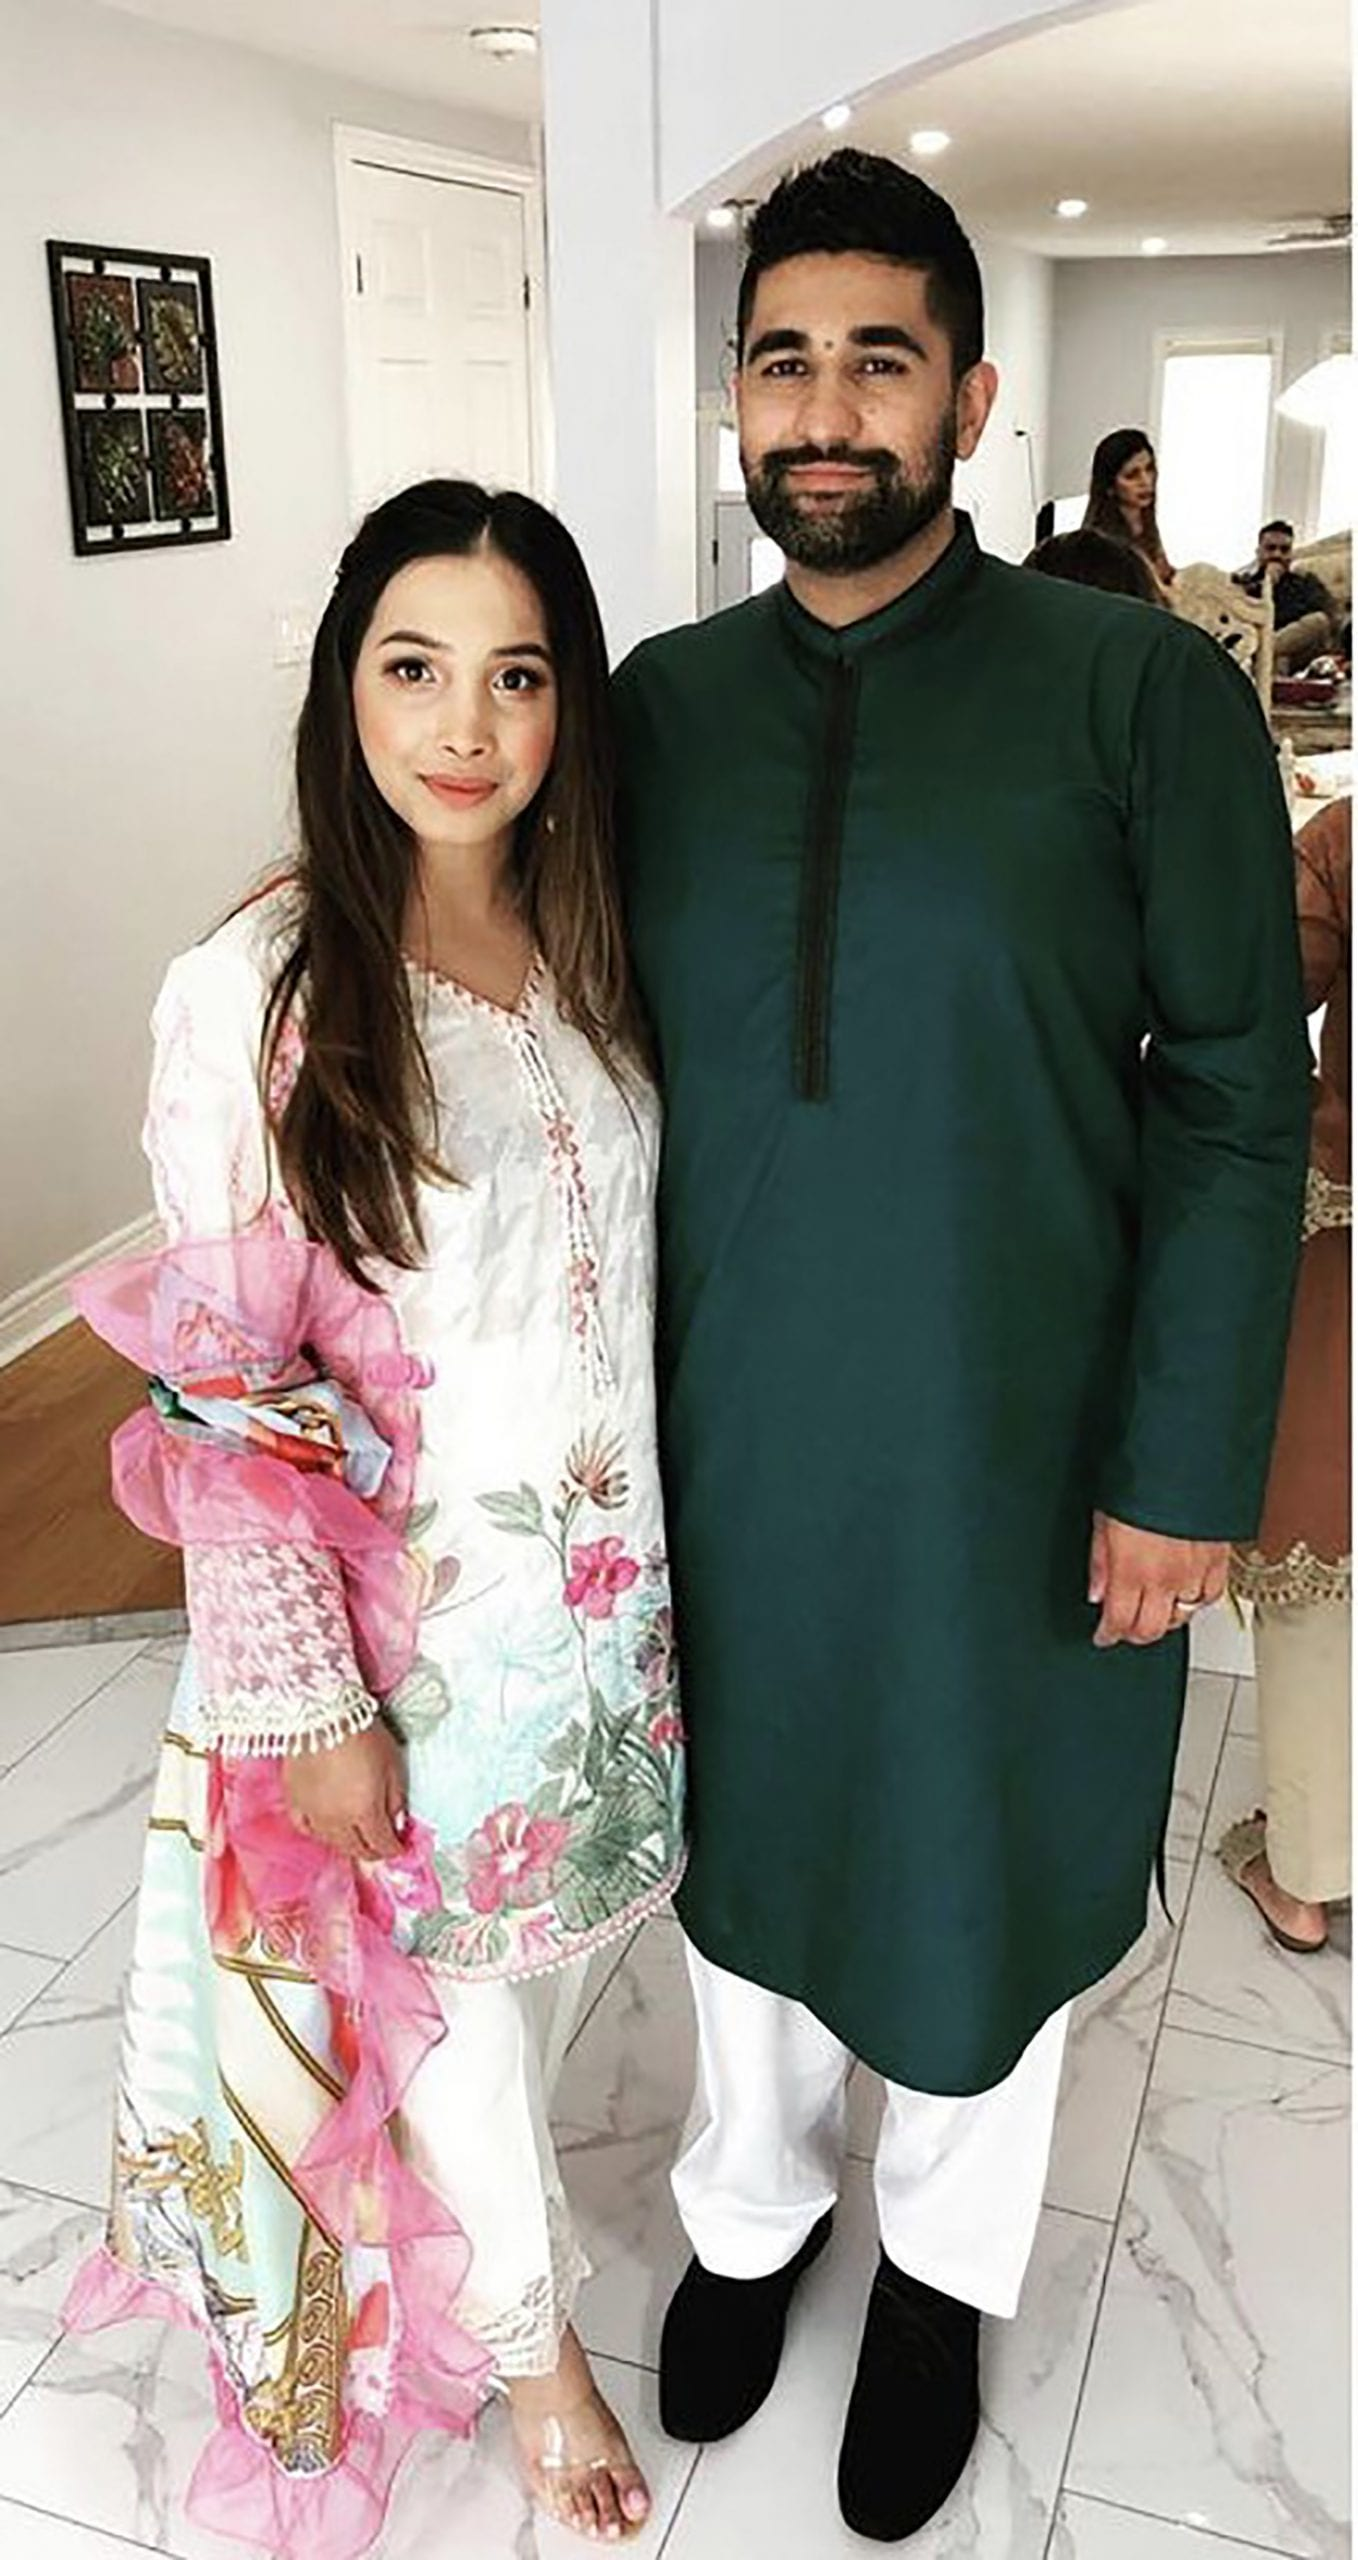 Mubina Sami Celebrating Eid Day with loved ones.